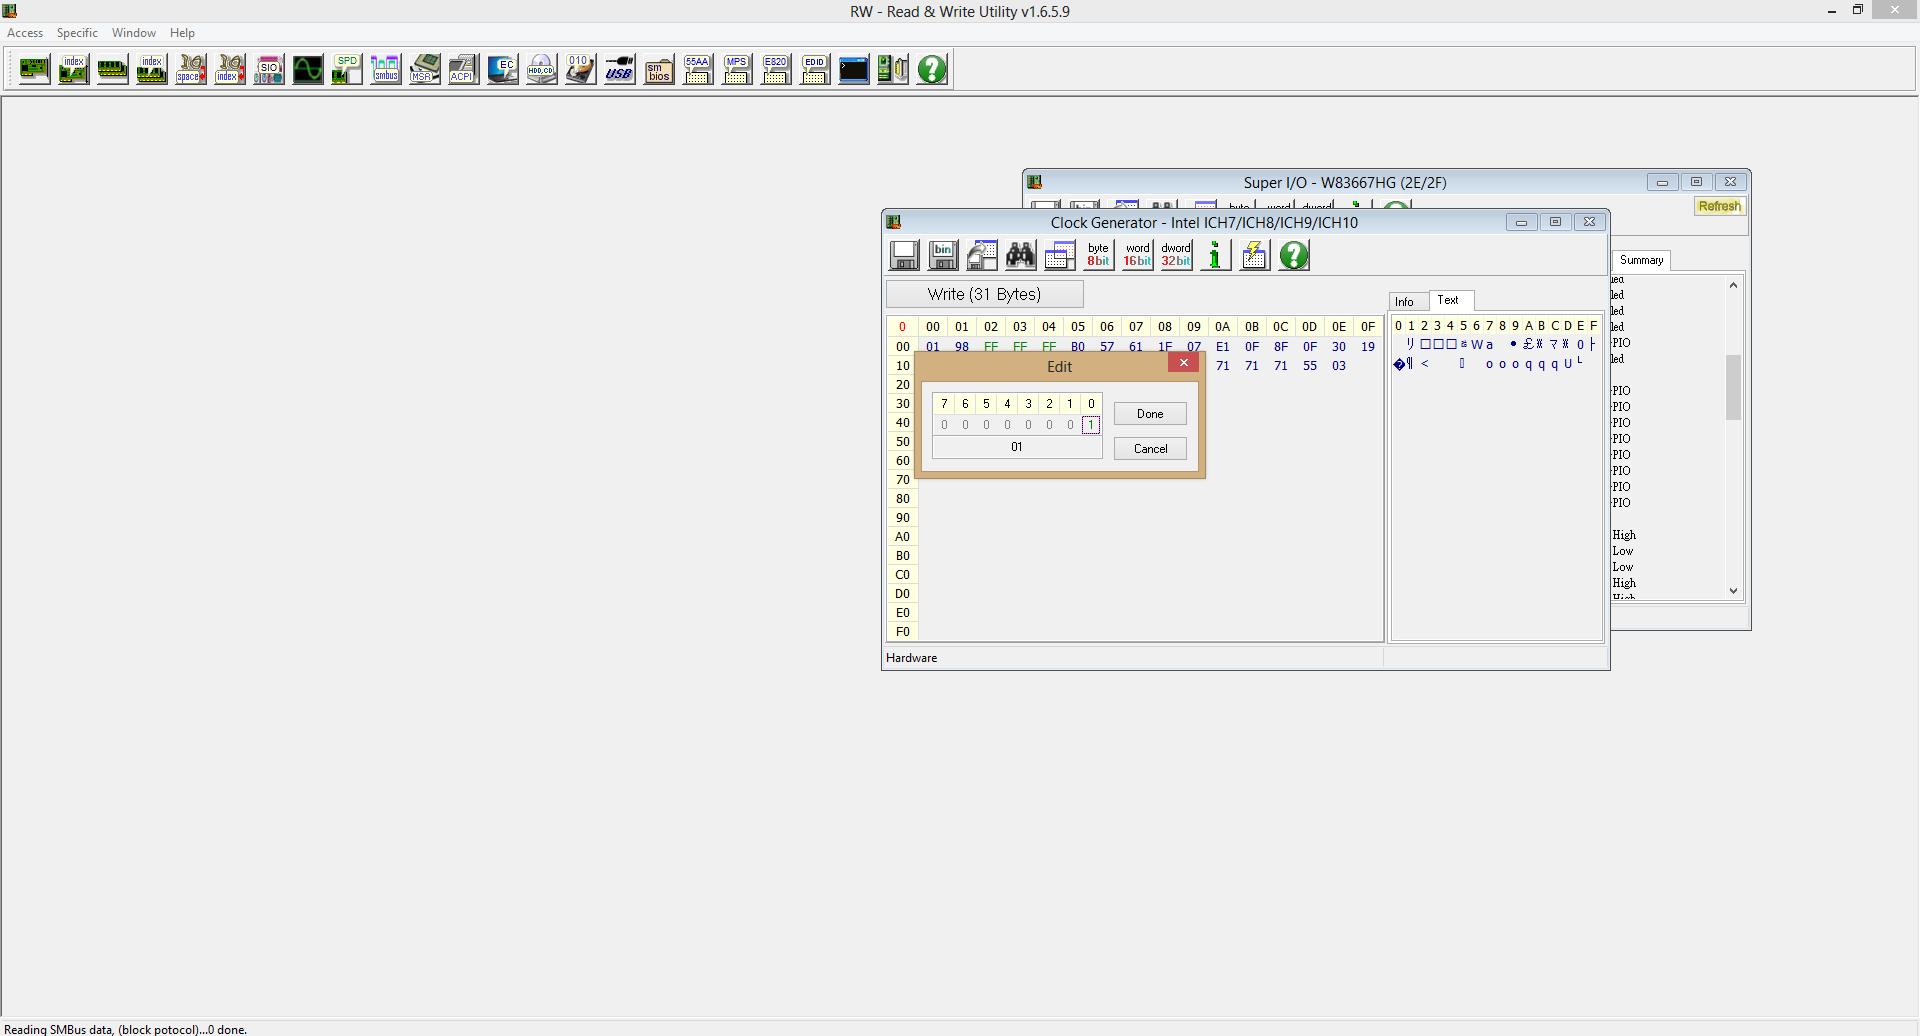 780406d1414060582-how-ubertakten-mit-rw-everything-auf-non-oc-boards-alternative-zu-setfsb-rwsavesmbus.png